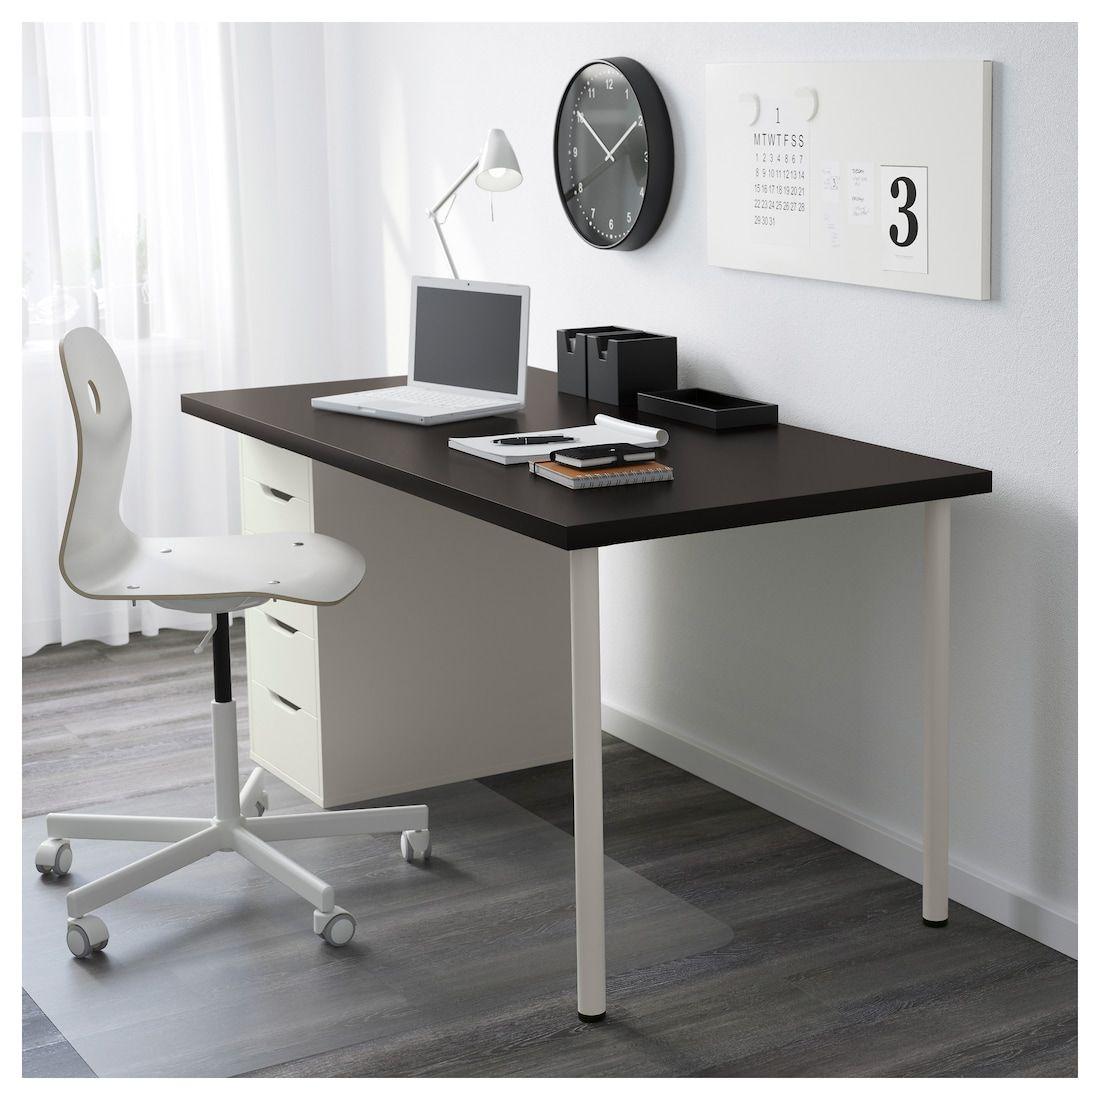 Alex Drawer Unit White 14 1 8x27 1 2 Ikea In 2020 Cheap Office Furniture Drawer Unit Ikea